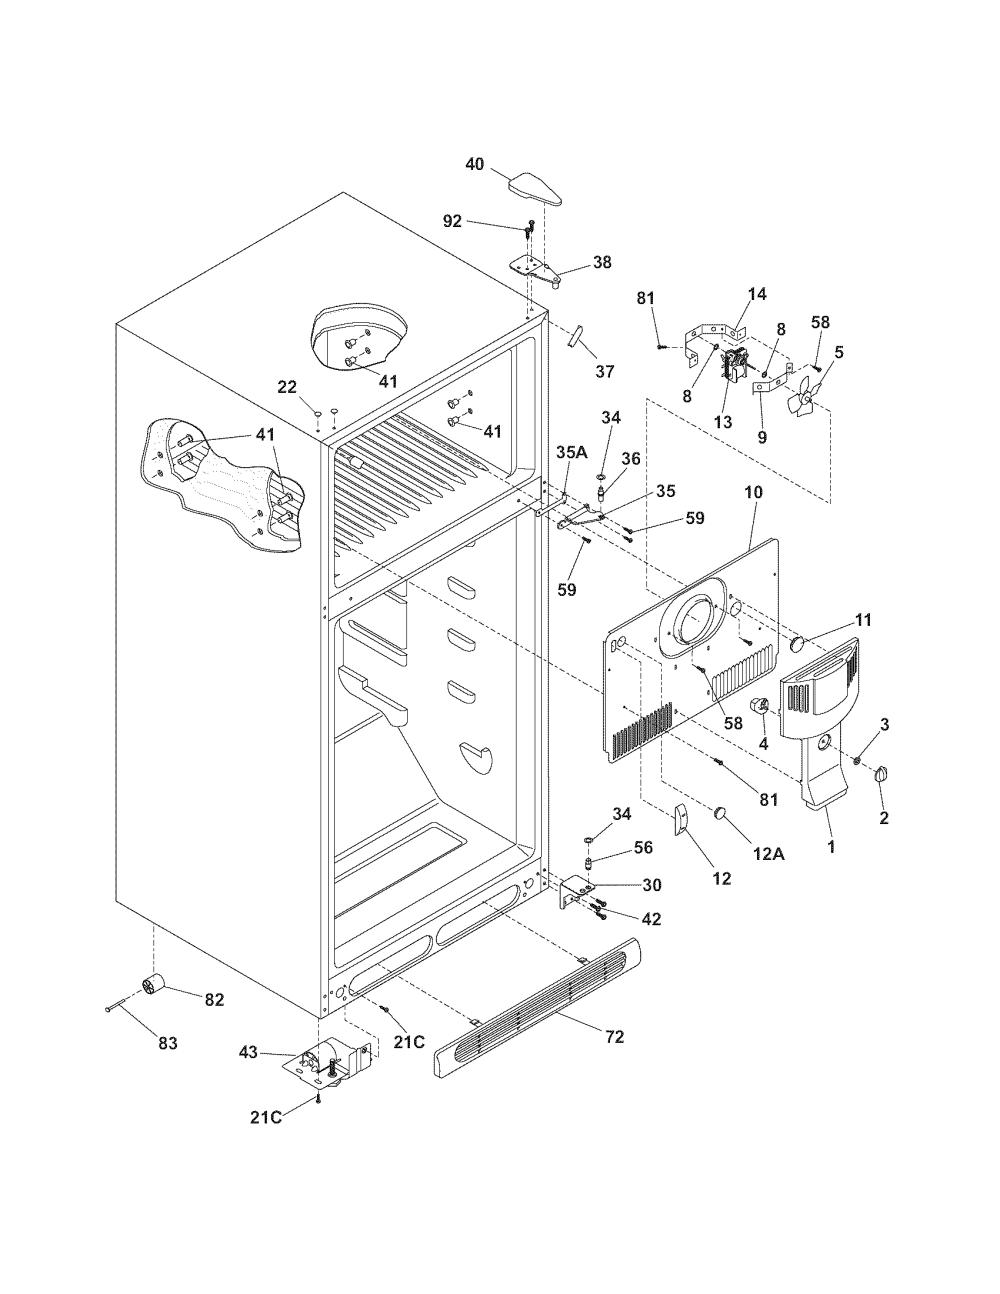 medium resolution of kenmore refrigerator relay wiring diagram wiring library kenmore heating element wiring diagram kenmore model 25365812508 top